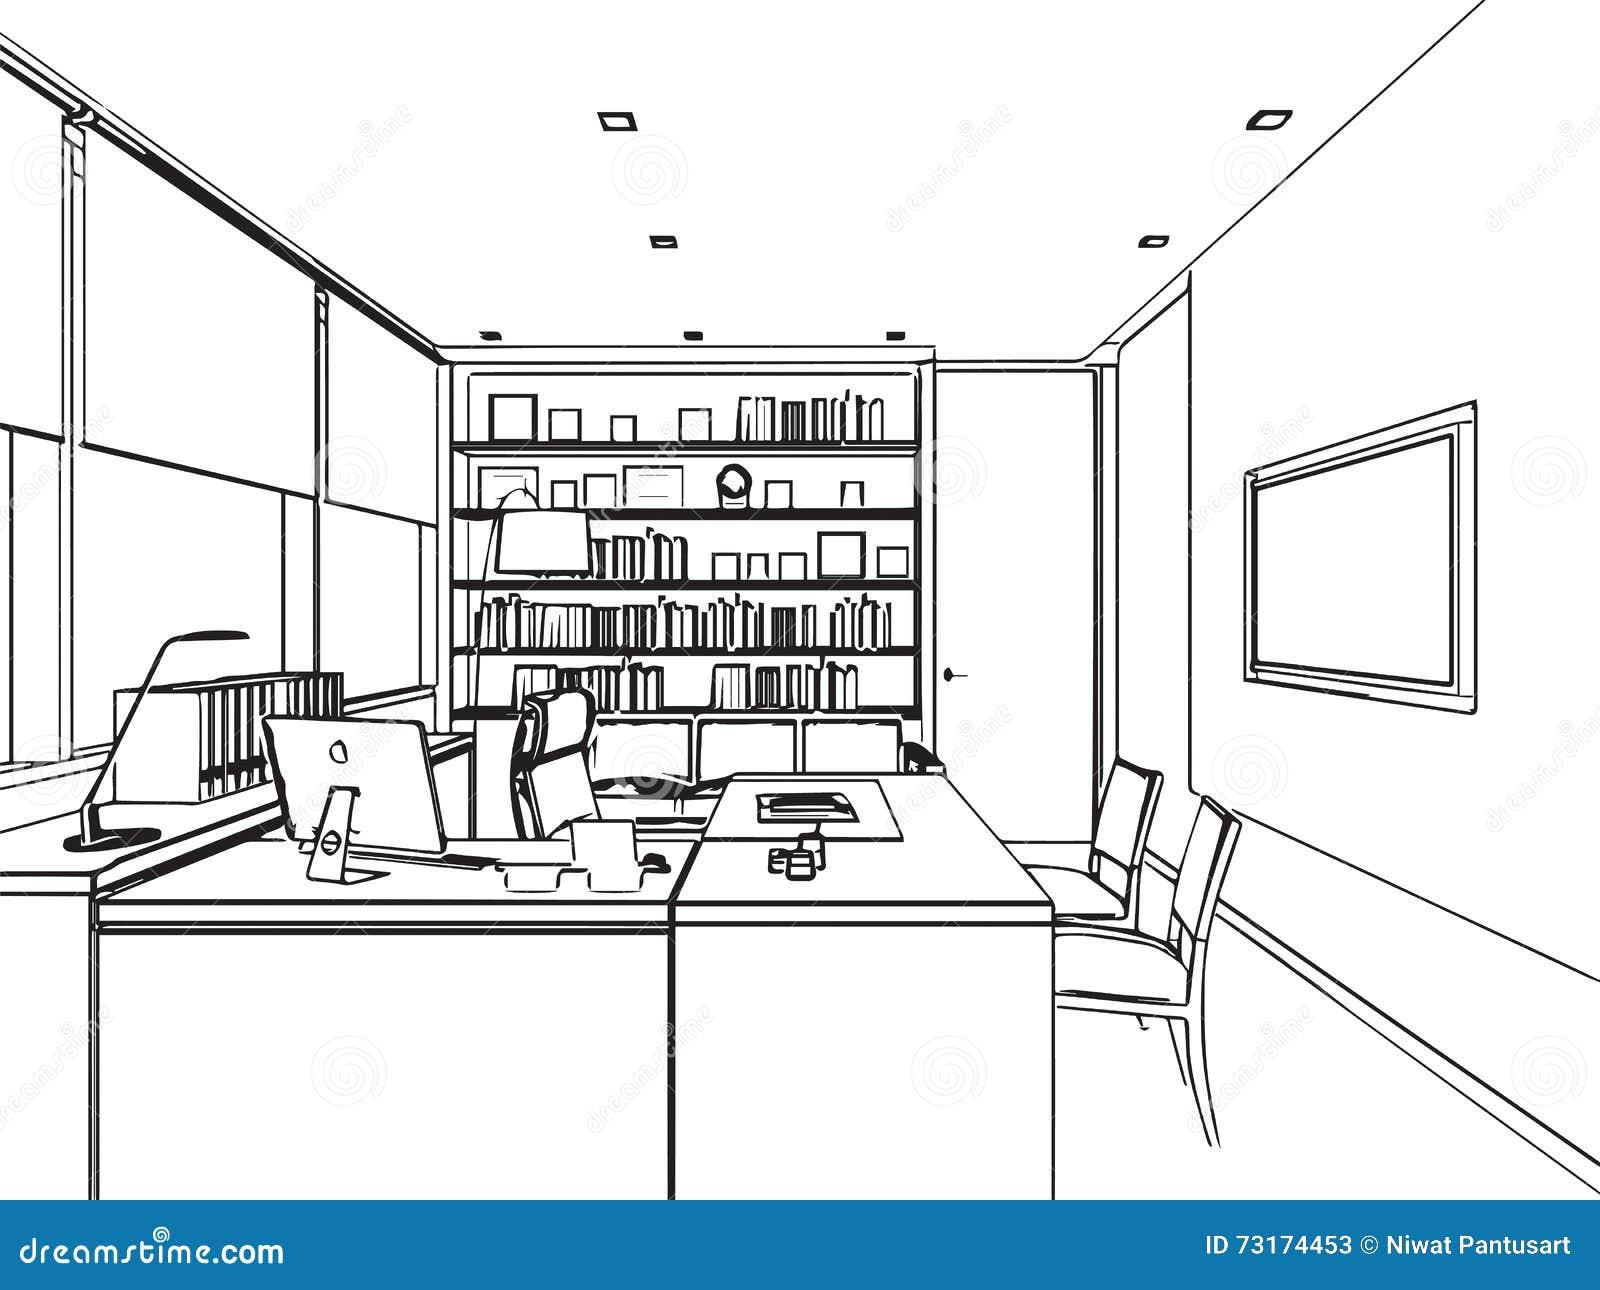 Online Floor Plan Drawing Program Wewnętrzna Konturu Nakreślenia Rysunku Perspektywa